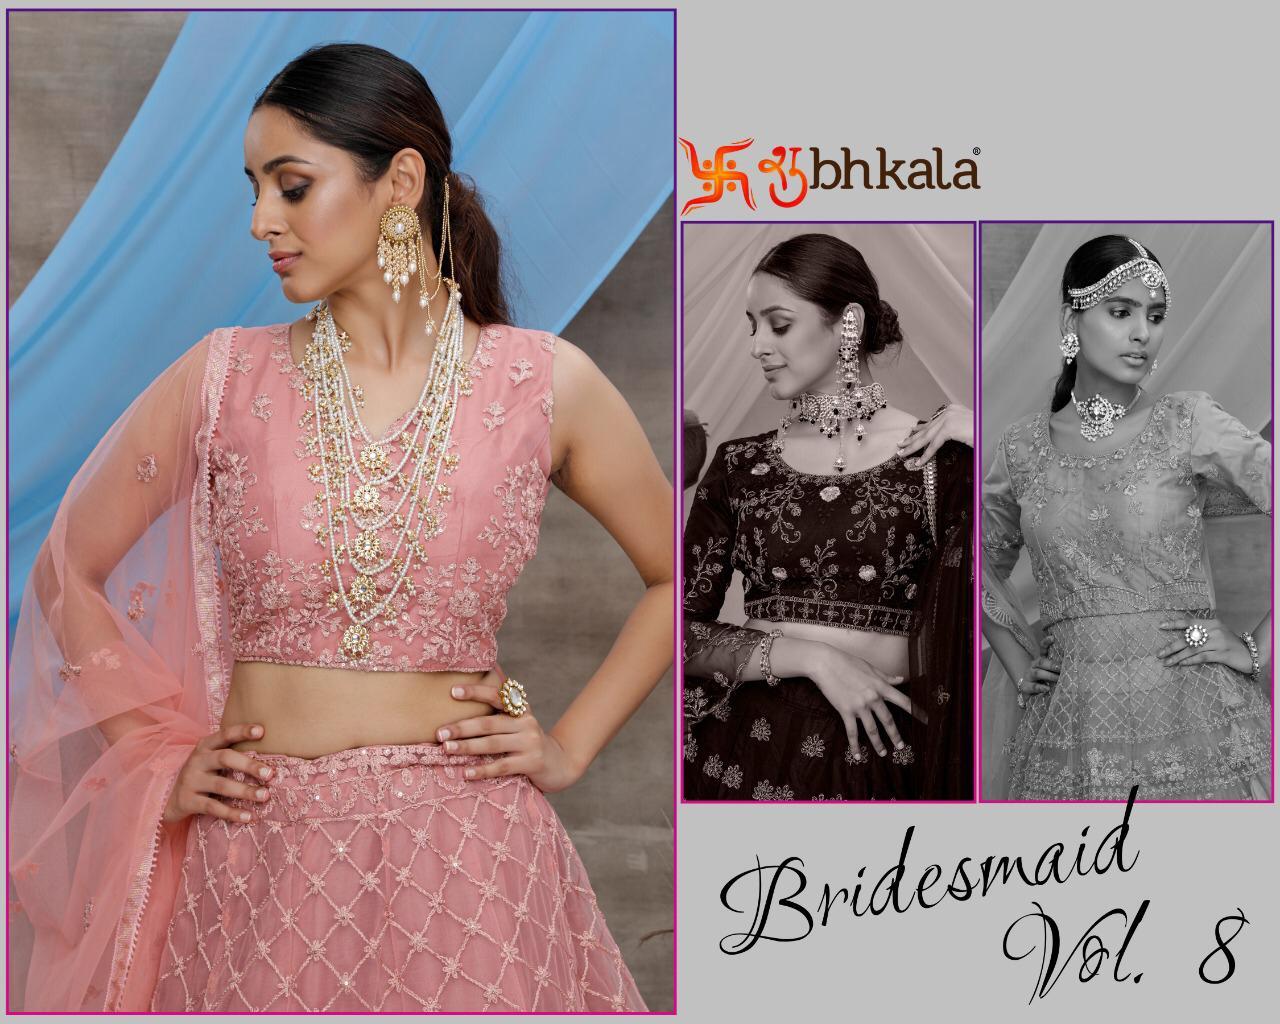 Shubhkala Bridesmaid Vol 8 Exclusive Designer Net 1331-1335 Series Lehenga